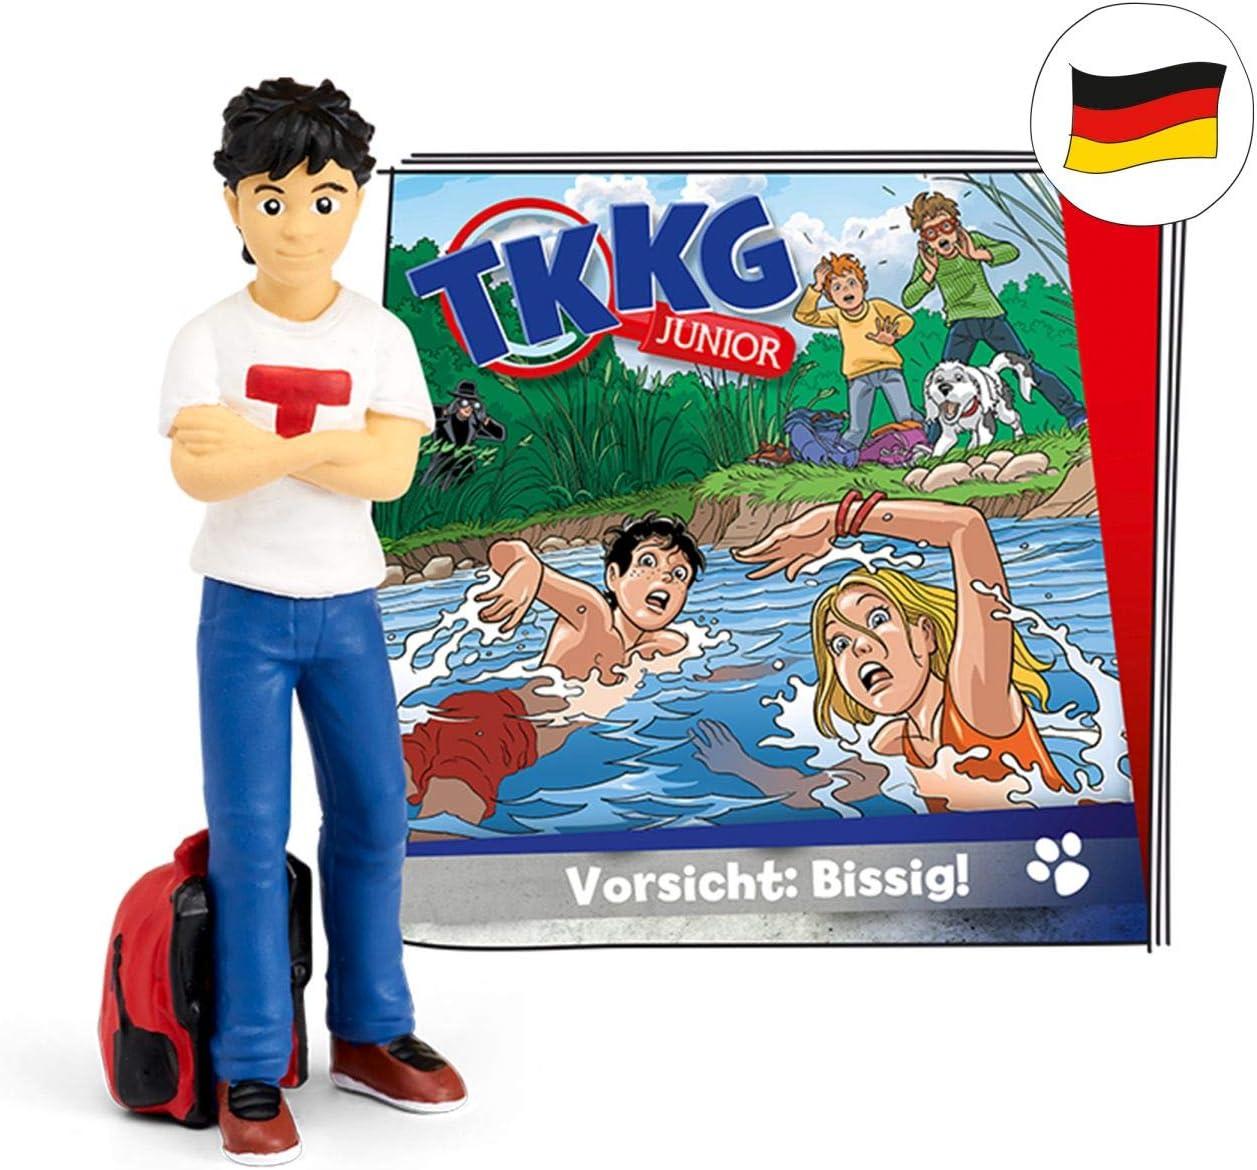 tonies 01-0182 TKKG Junior Caution: Bissig Colourful Hearing Figure Episode 2